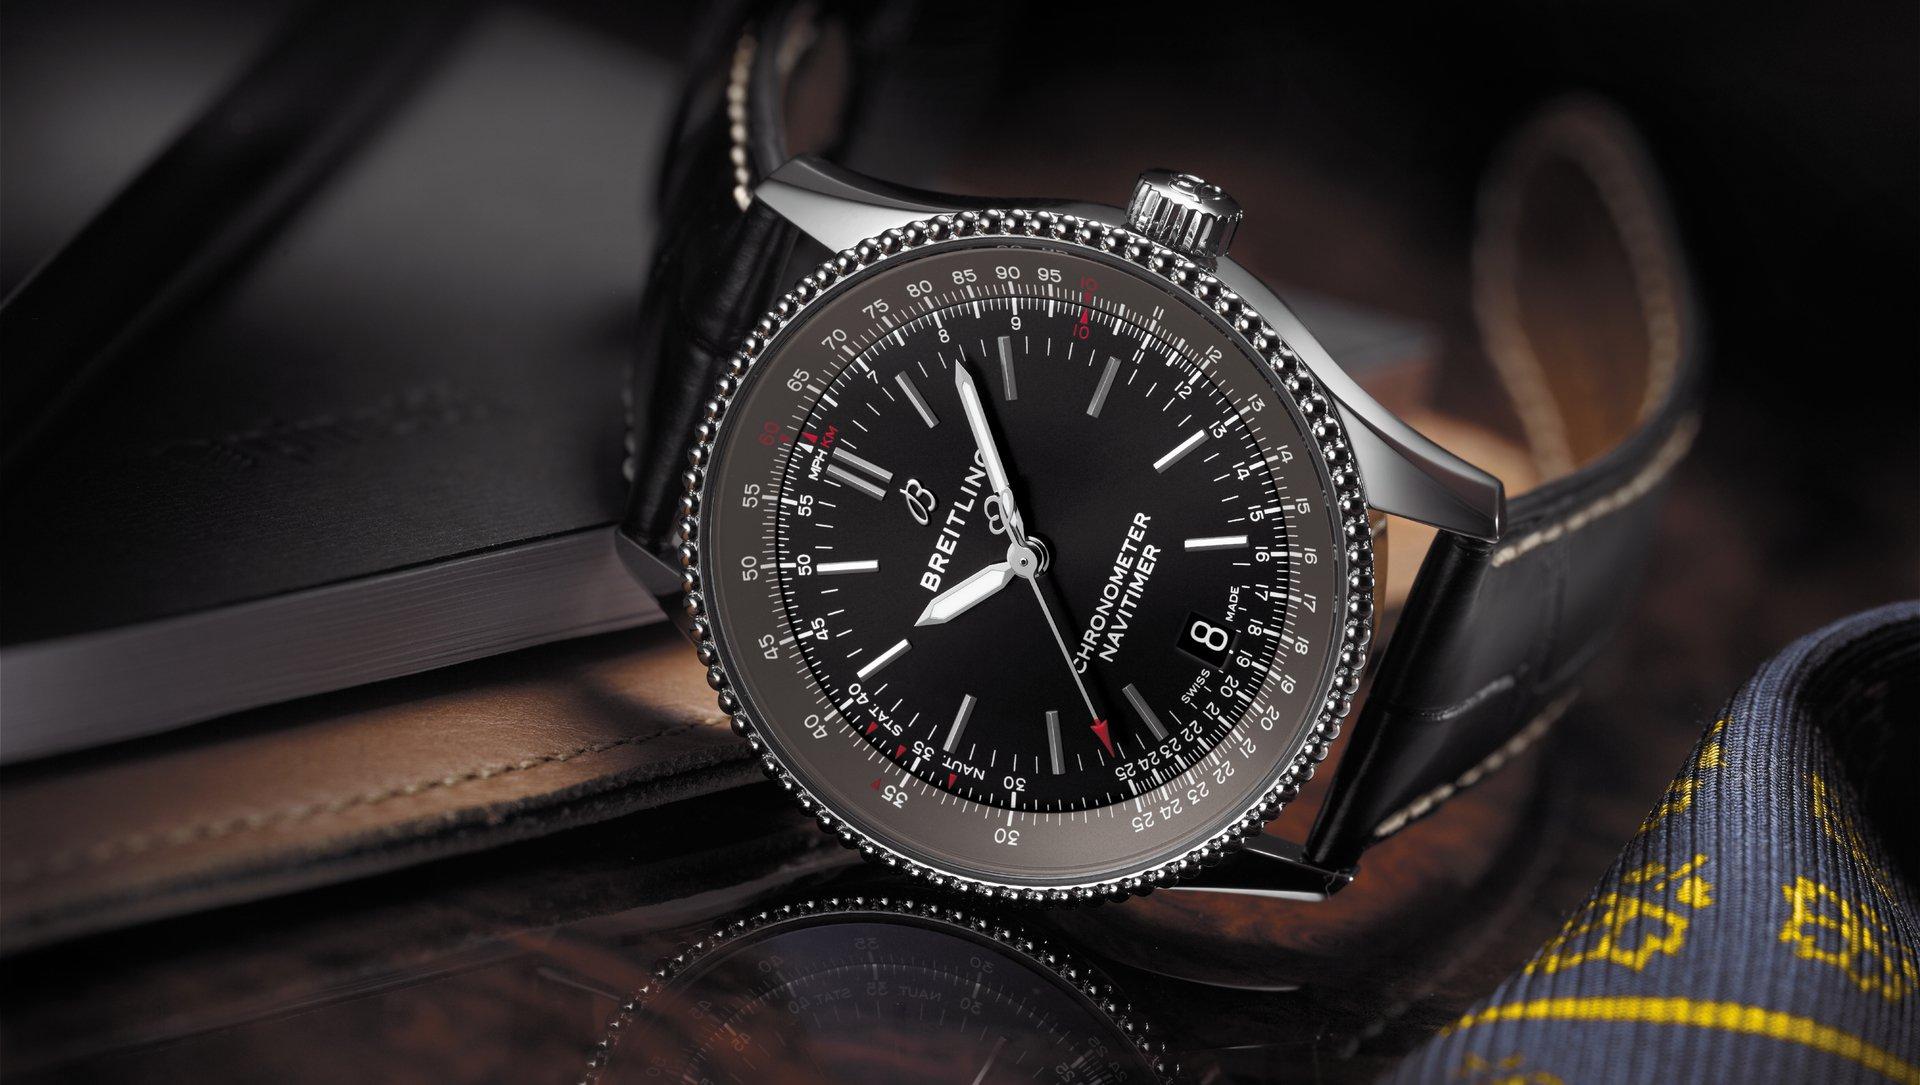 Naziv: navitimer-1-automatic-38-with-black-dial-and-black-alligator-leather-strap.jpg, pregleda: 160, veličina: 232,4 KB